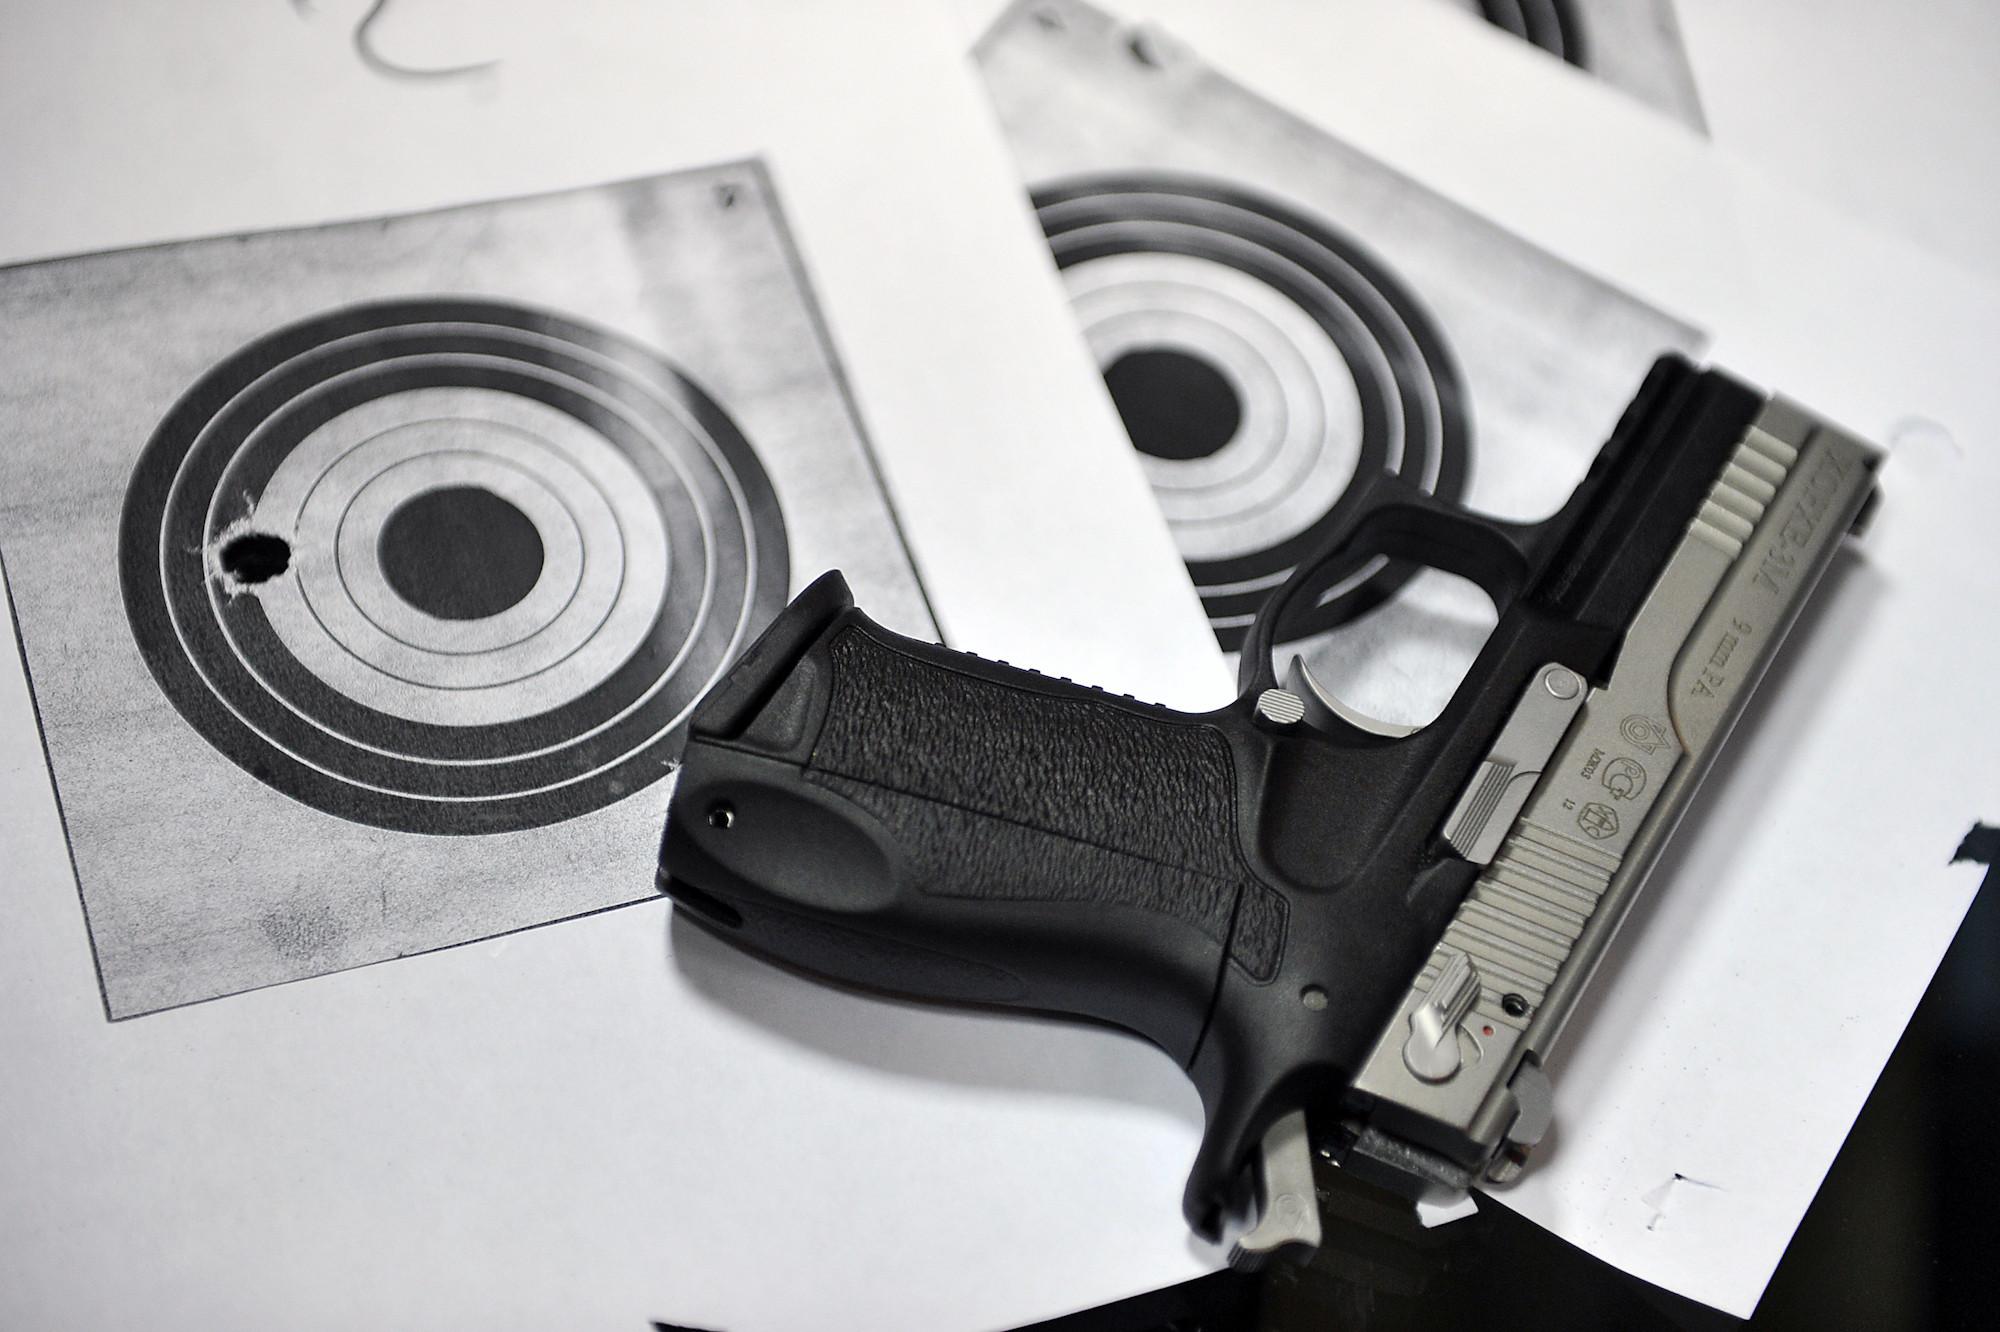 <p><span>Травматический пистолет. Фото: &copy; РИА Новости/Руслан Кривобок</span></p>